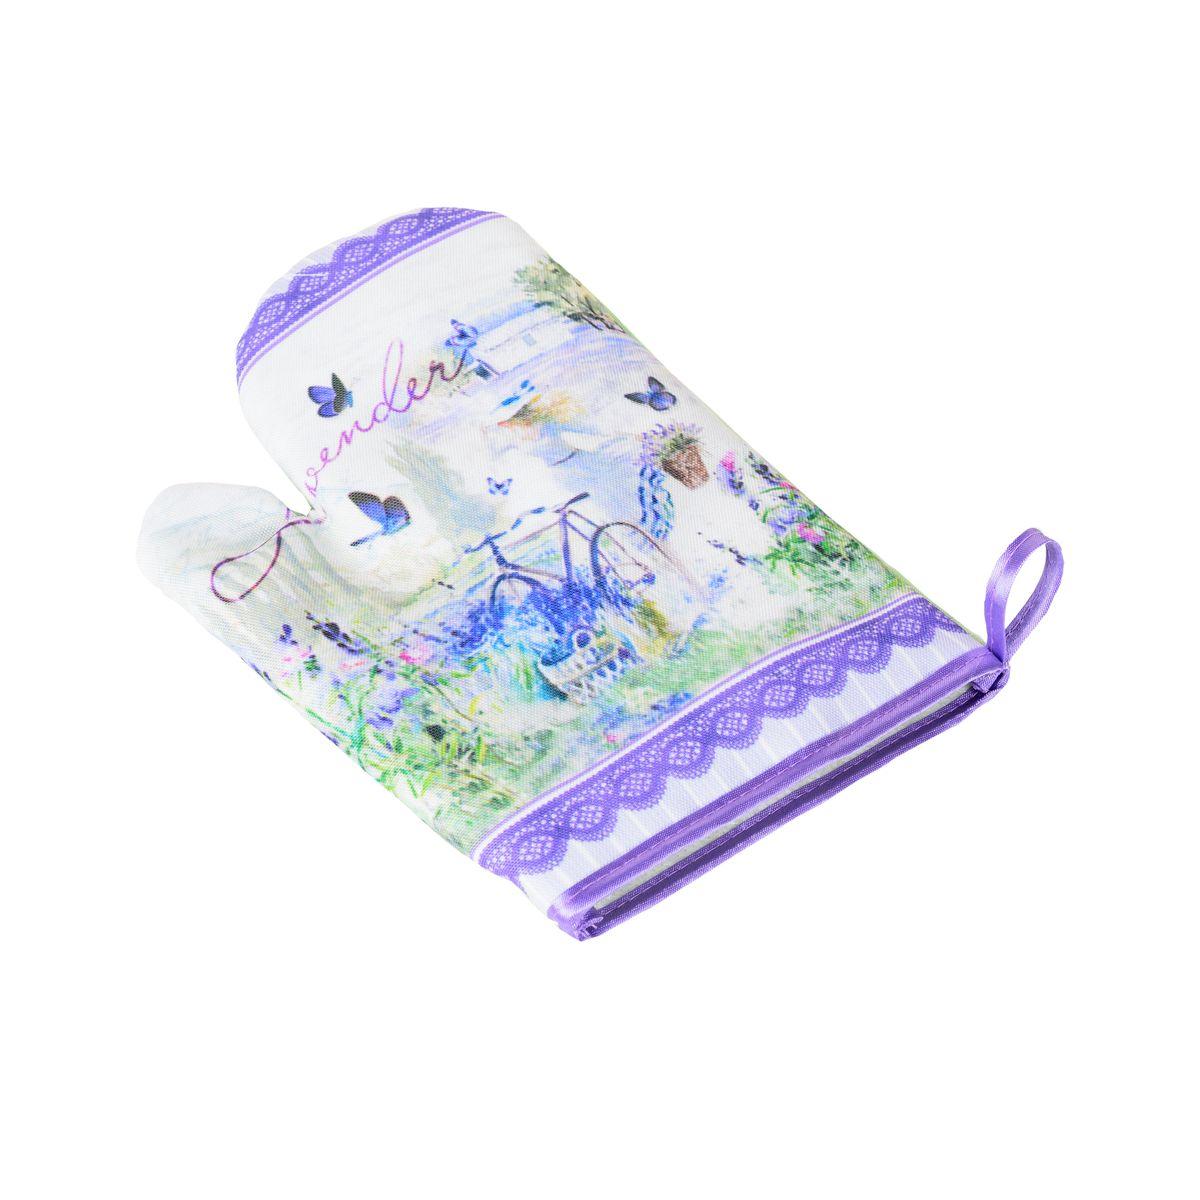 Варежка-прихватка Gift'n'Home TEX-01 Лаванда, цвет: фиолетовый, 25 х 17 см миниатюра варежка цвет серебристый 6 см